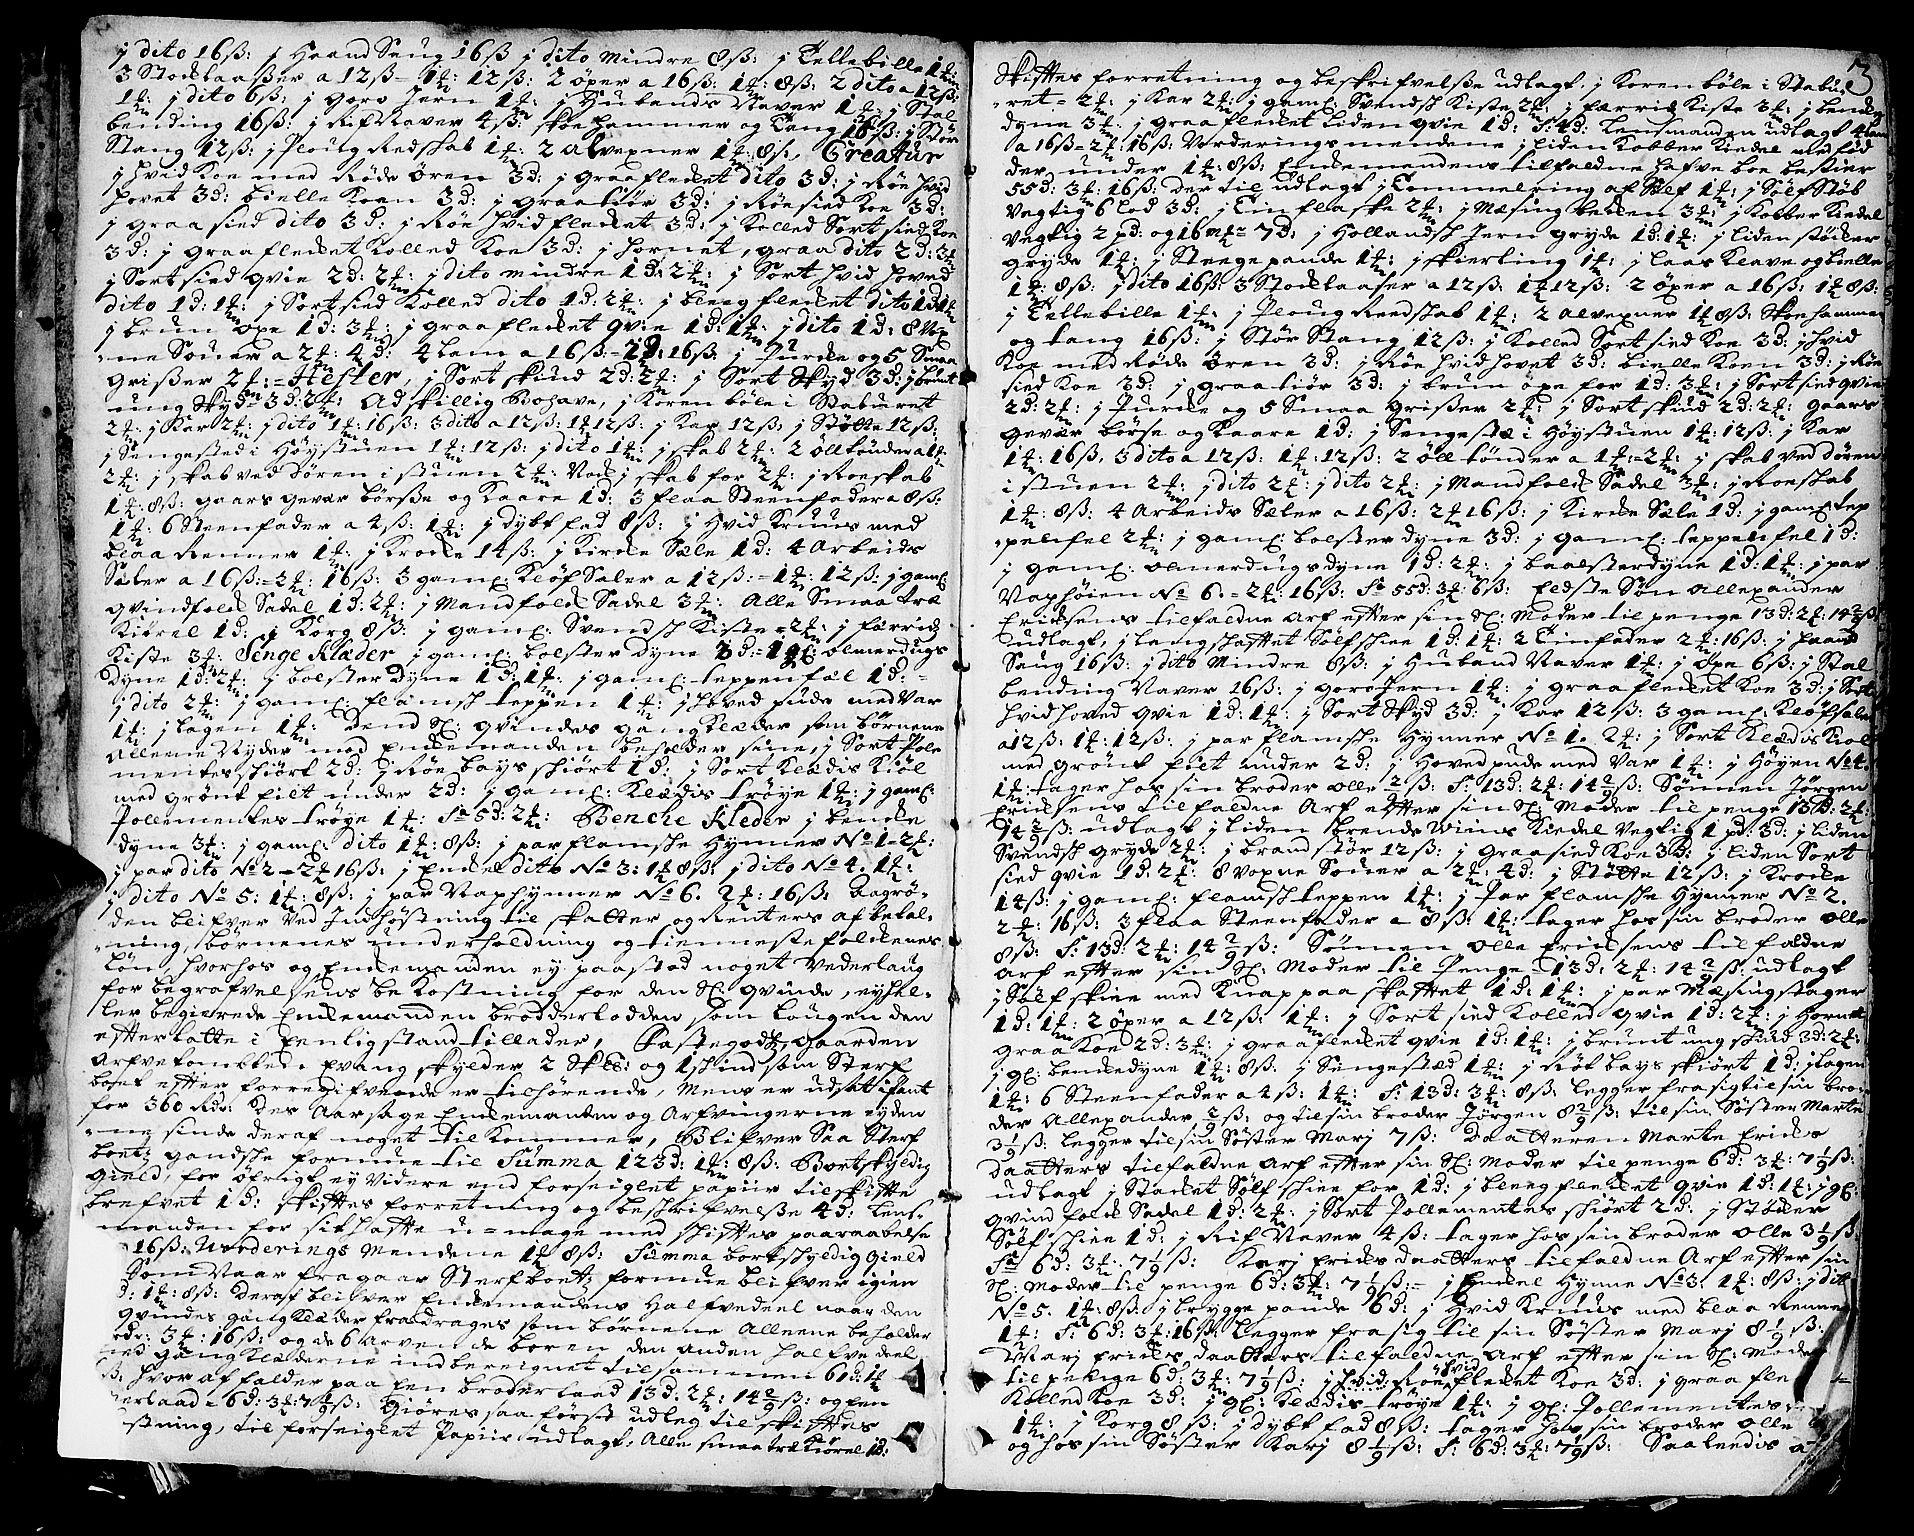 SAH, Toten tingrett, J/Ja/L0006: Skifteprotokoll, 1706-1722, s. 2b-3a